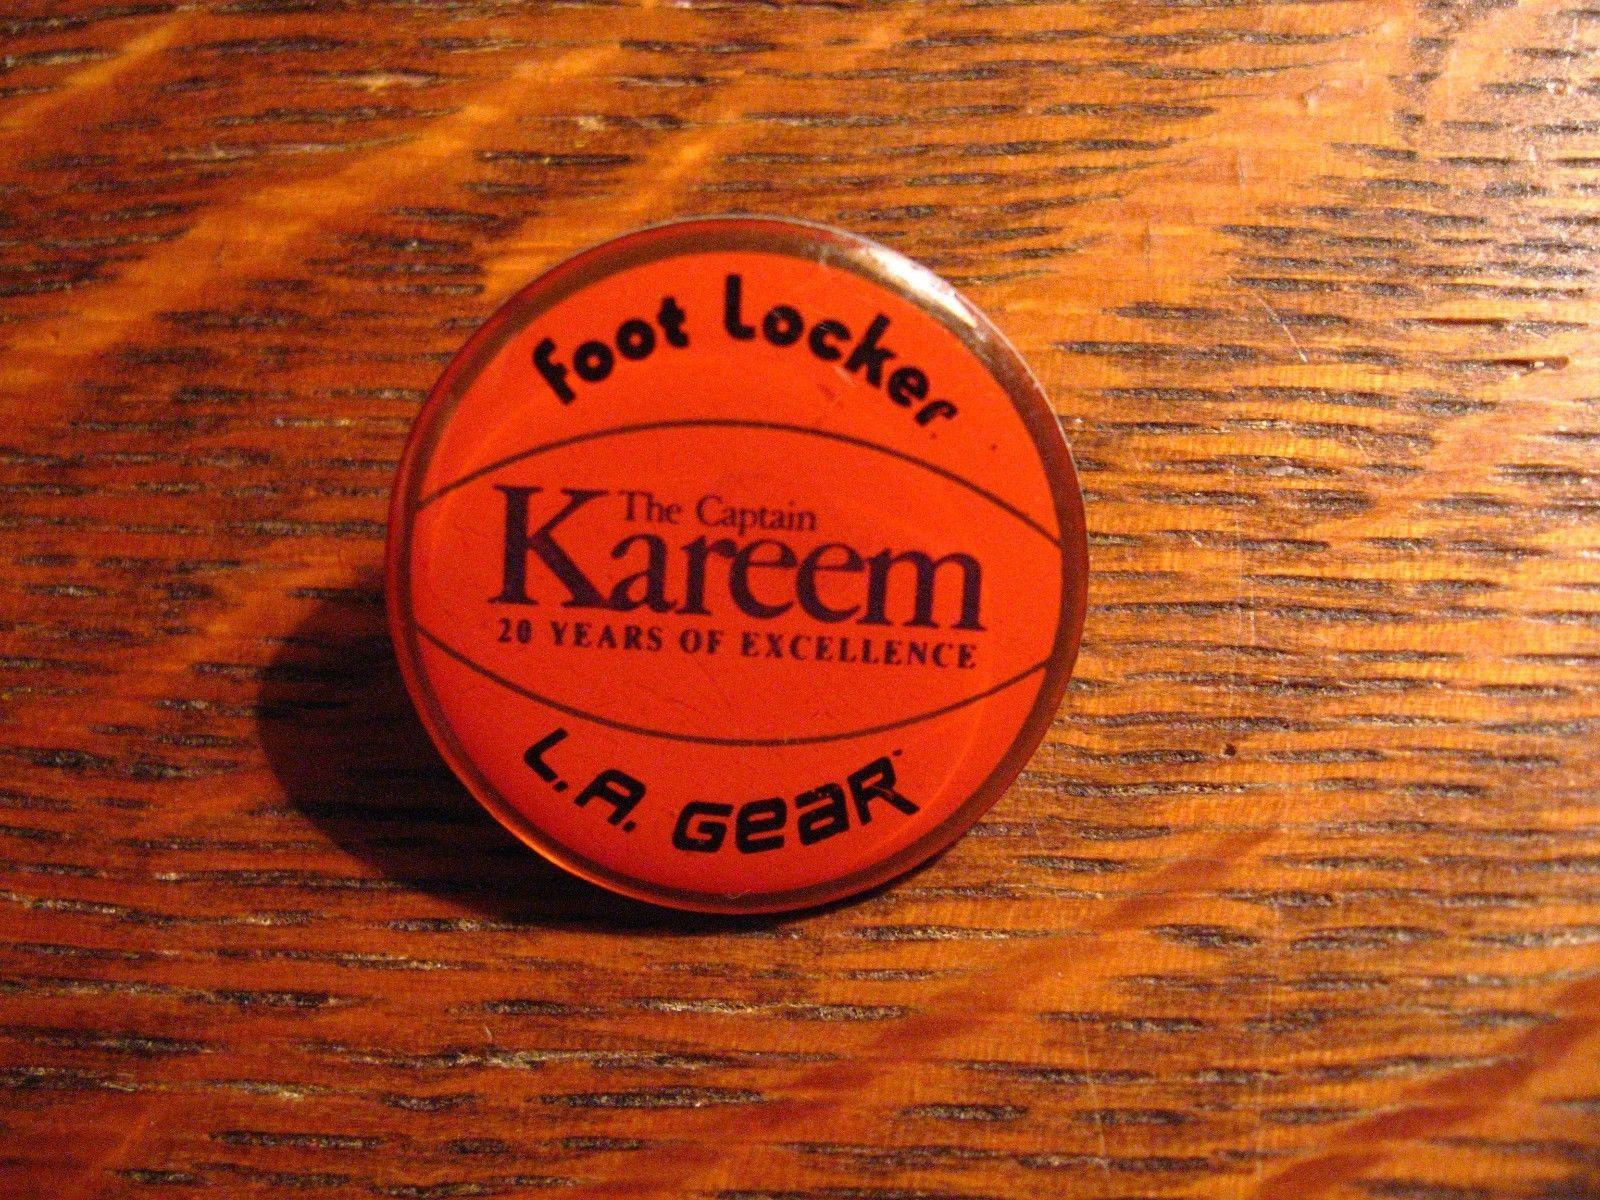 Kareem Abdul Jabbar Pin de Solapa - Vintage L. A. Gear Pie Armario Baloncesto